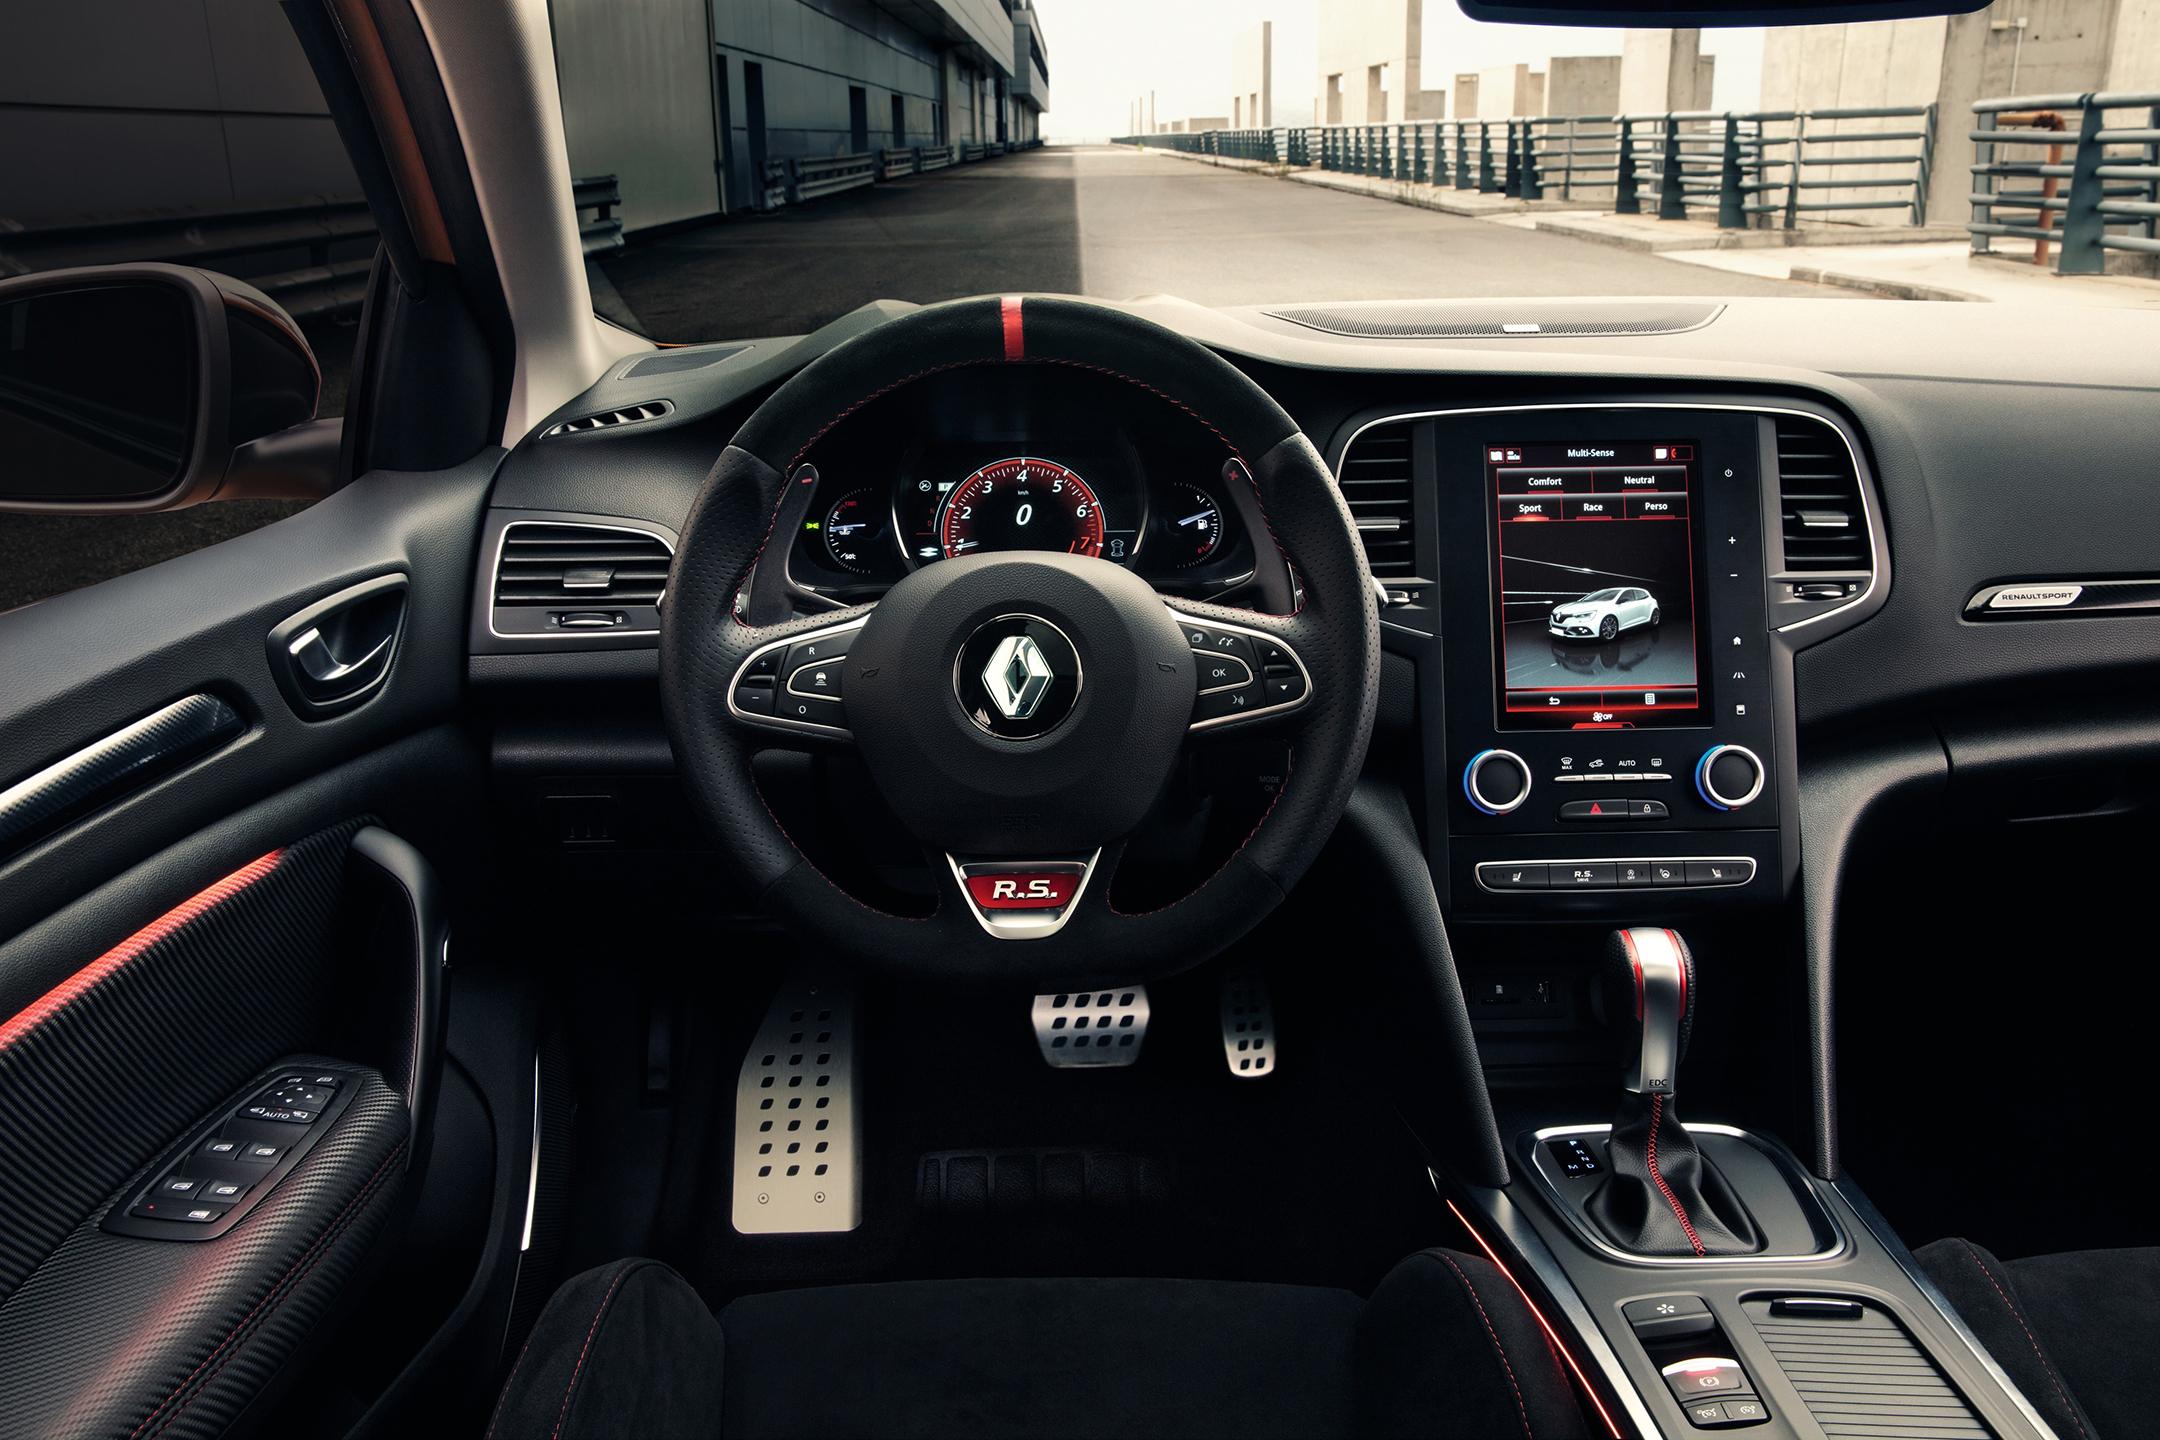 Renault Mégane R.S. - 2017 - interior / intérieur